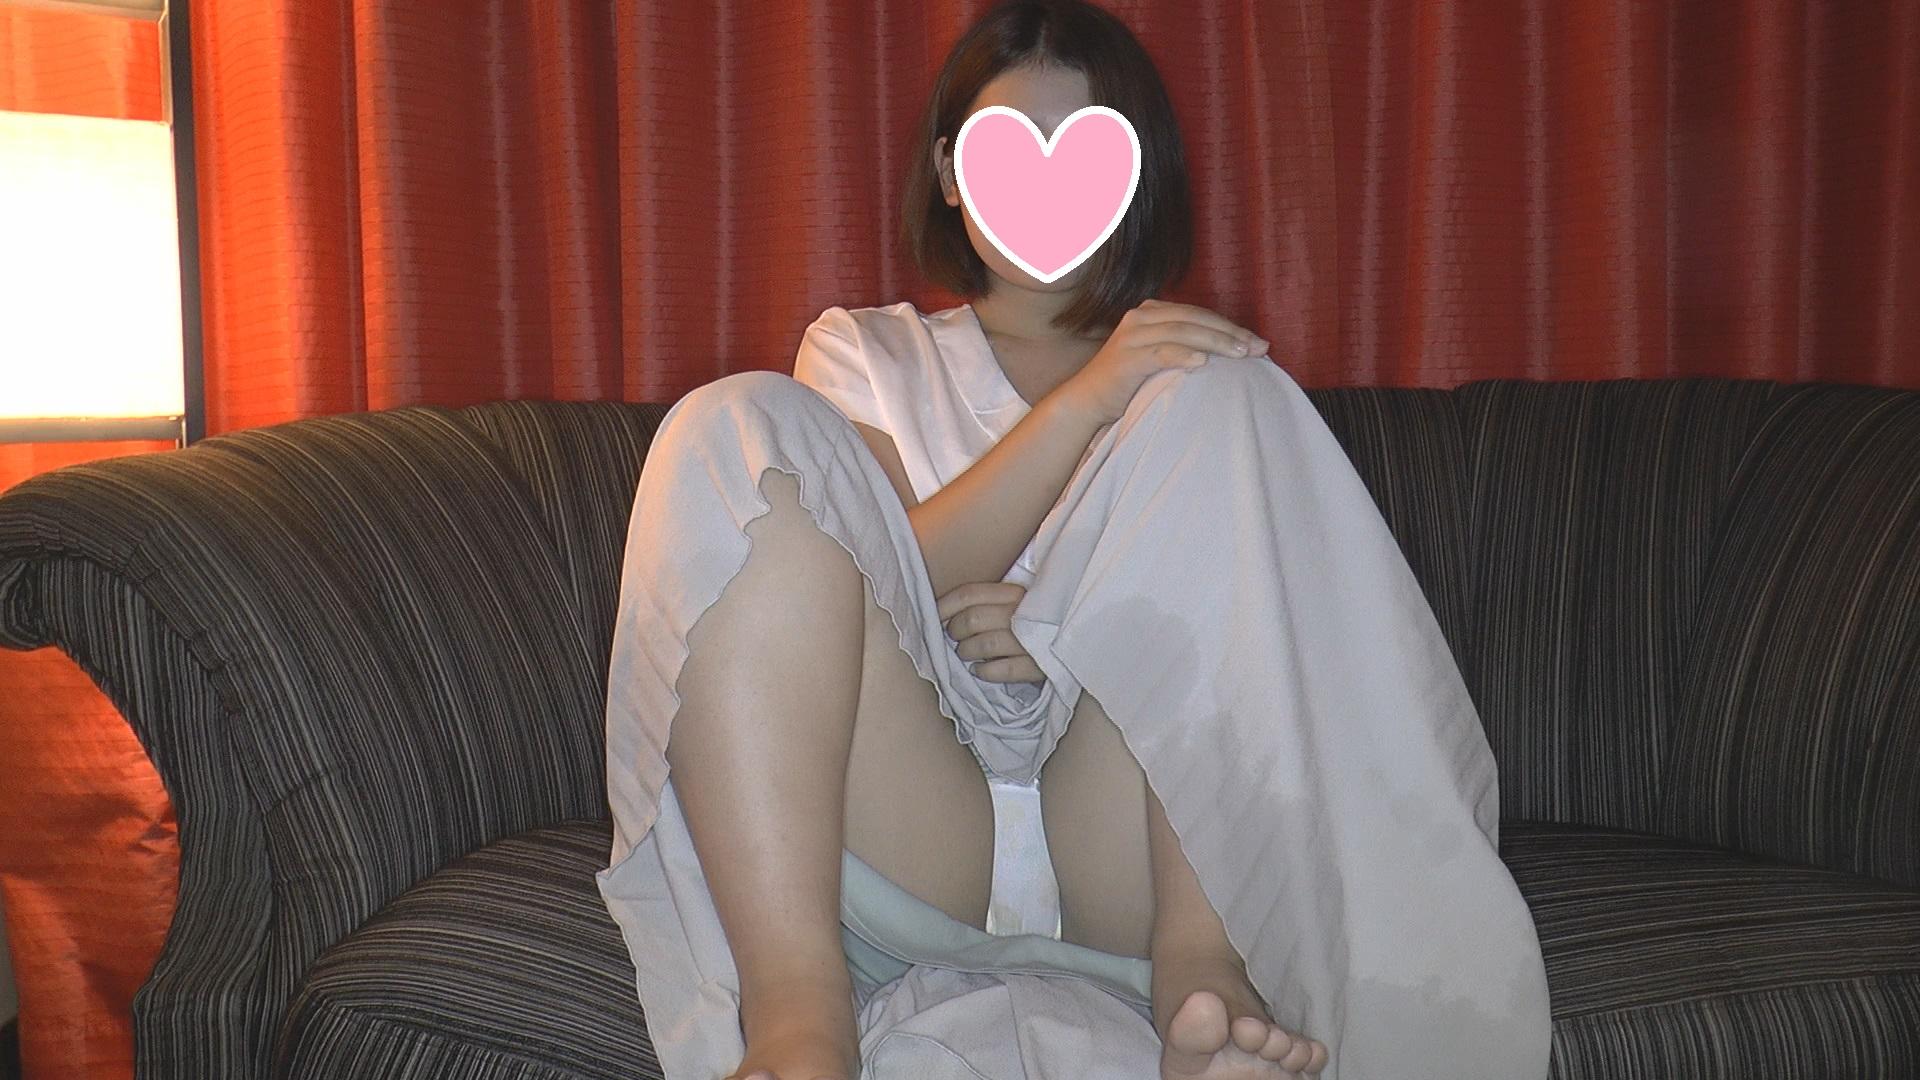 FC2 PPV 628322 【個人撮影】顔出し 素朴な18歳女子大生と、Hして、お尻にも挿入させてもらいましたwww【高画質版有】